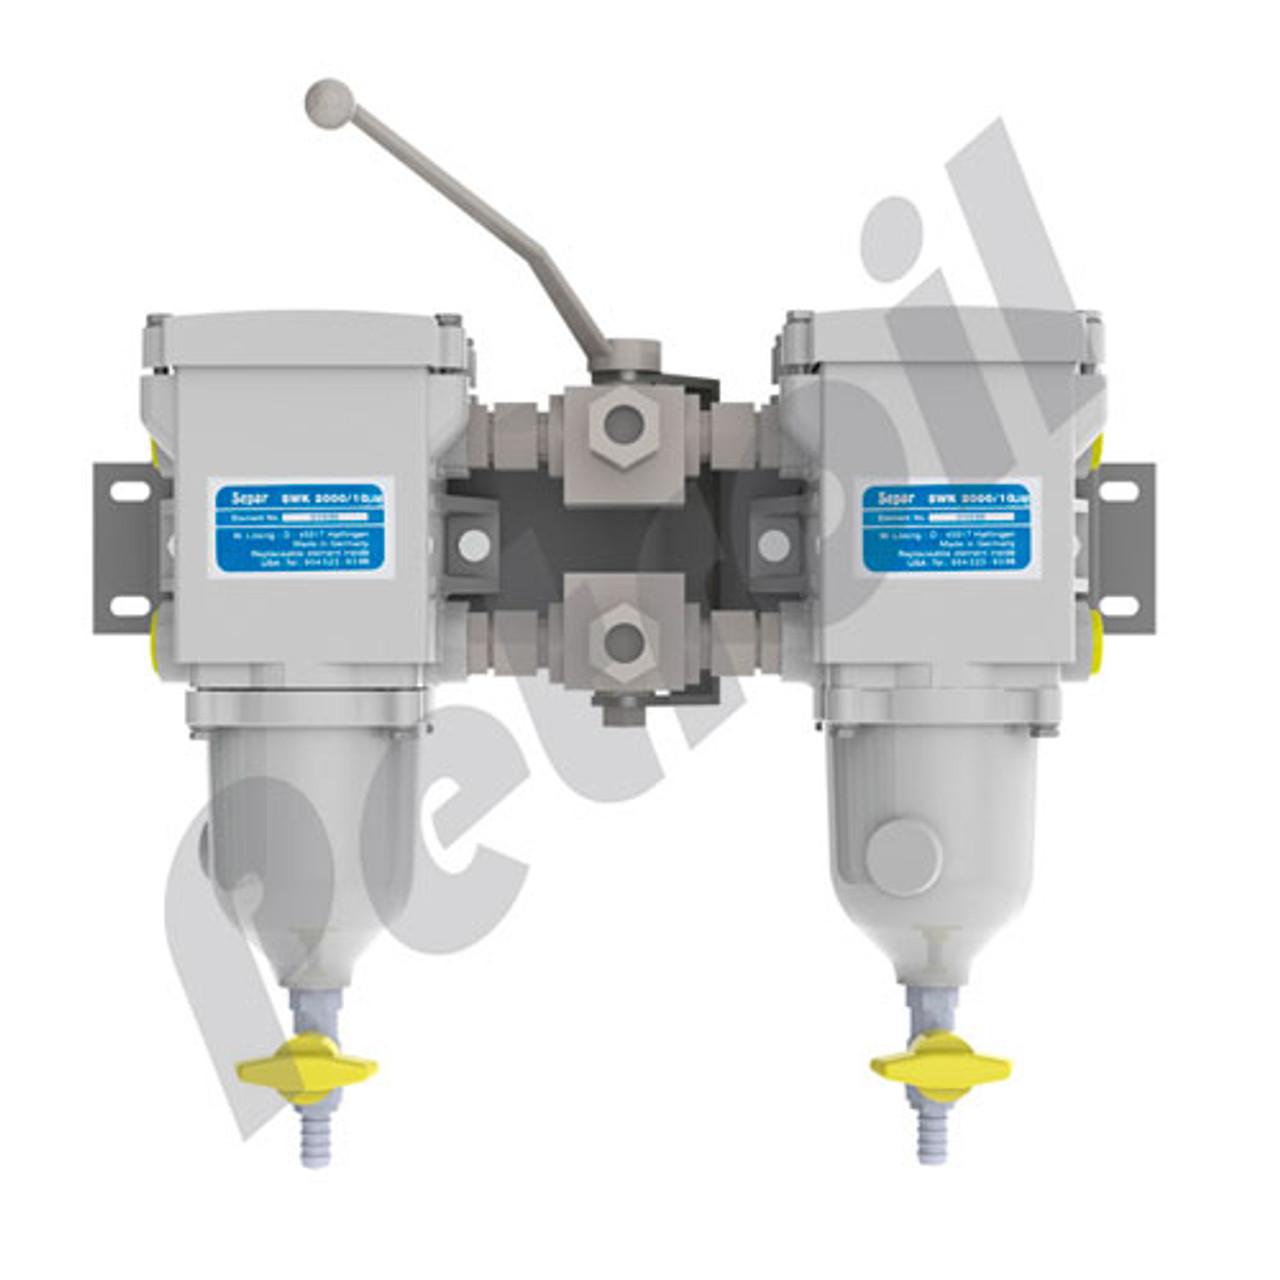 Separ 2000/10UMK-G - Duplex 158 GPH Fuel Water Separator with Metal Bowl, Water Contacts, and Gauge  SWK200010UMKG